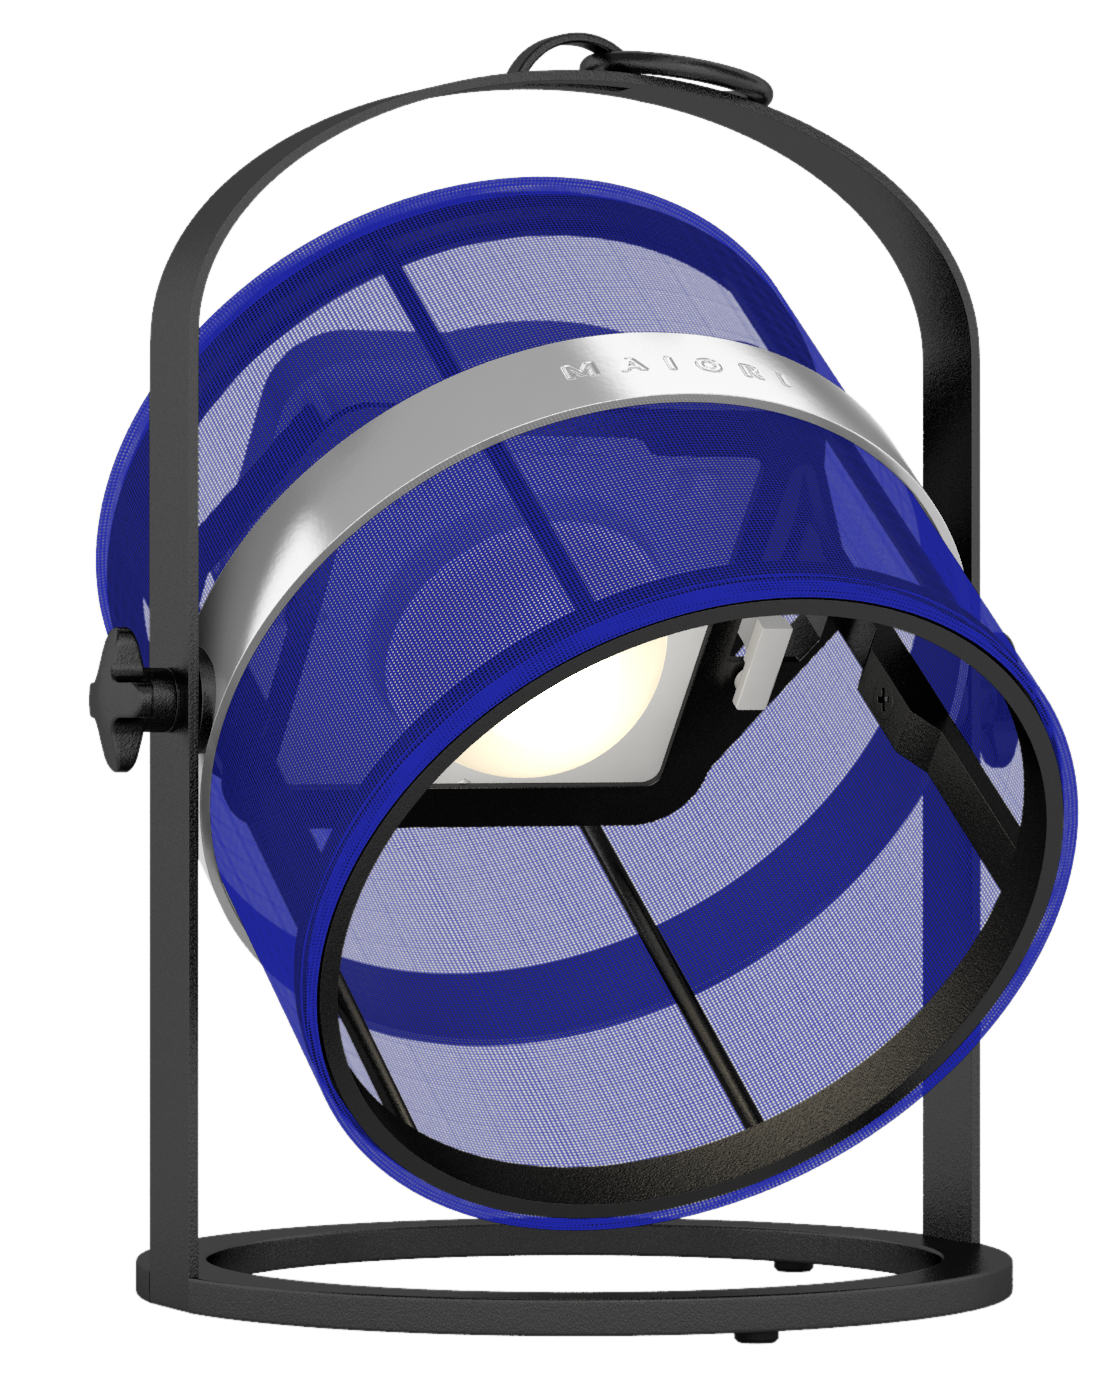 La Lampe Petite | Black Frame, Navy Blue Shade | View the